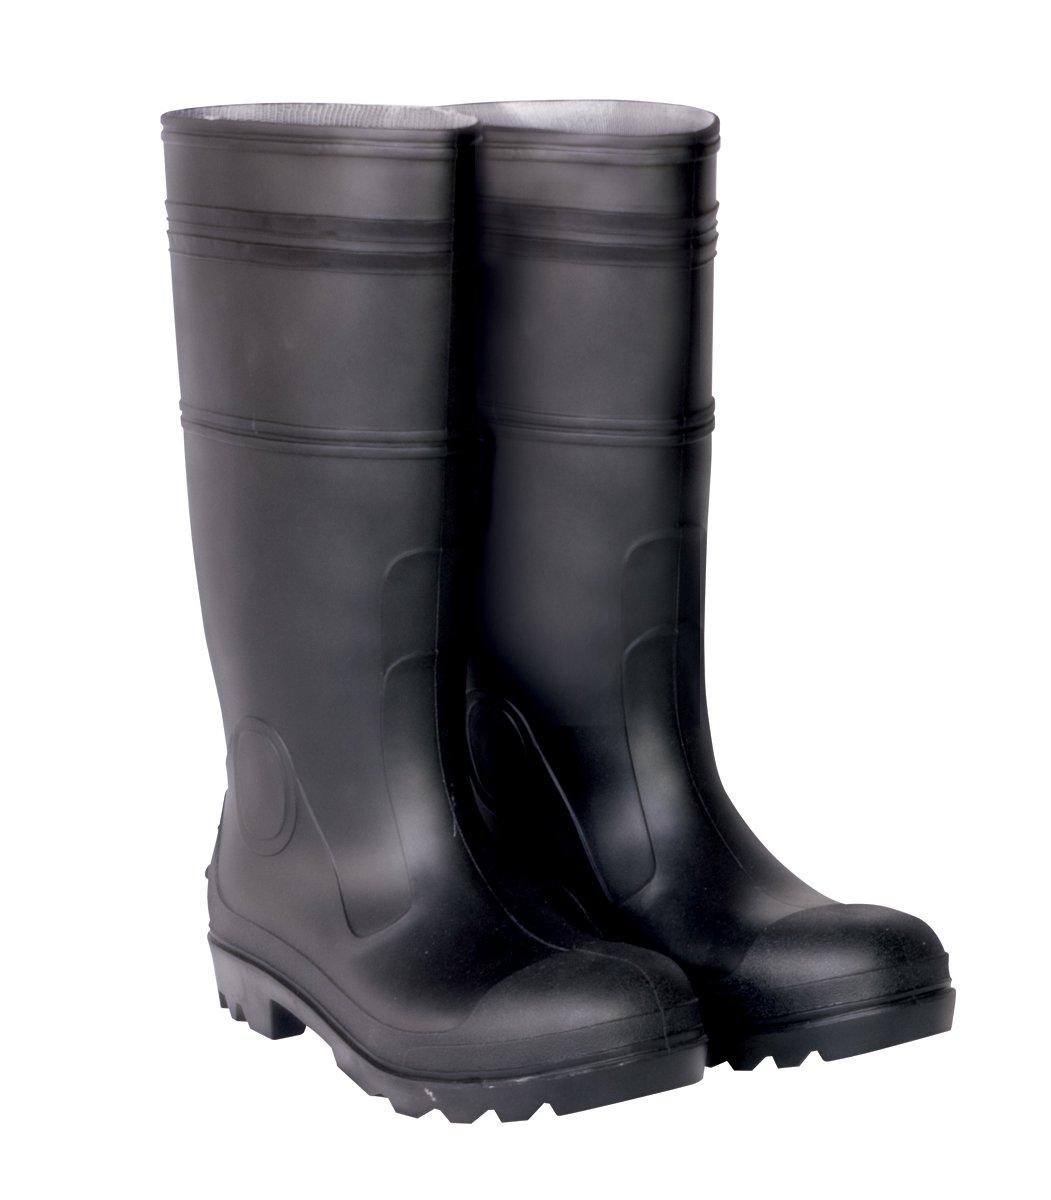 Amazon.com: CLC Rain Wear F23011 Over The Sock Black PVC Men&39s